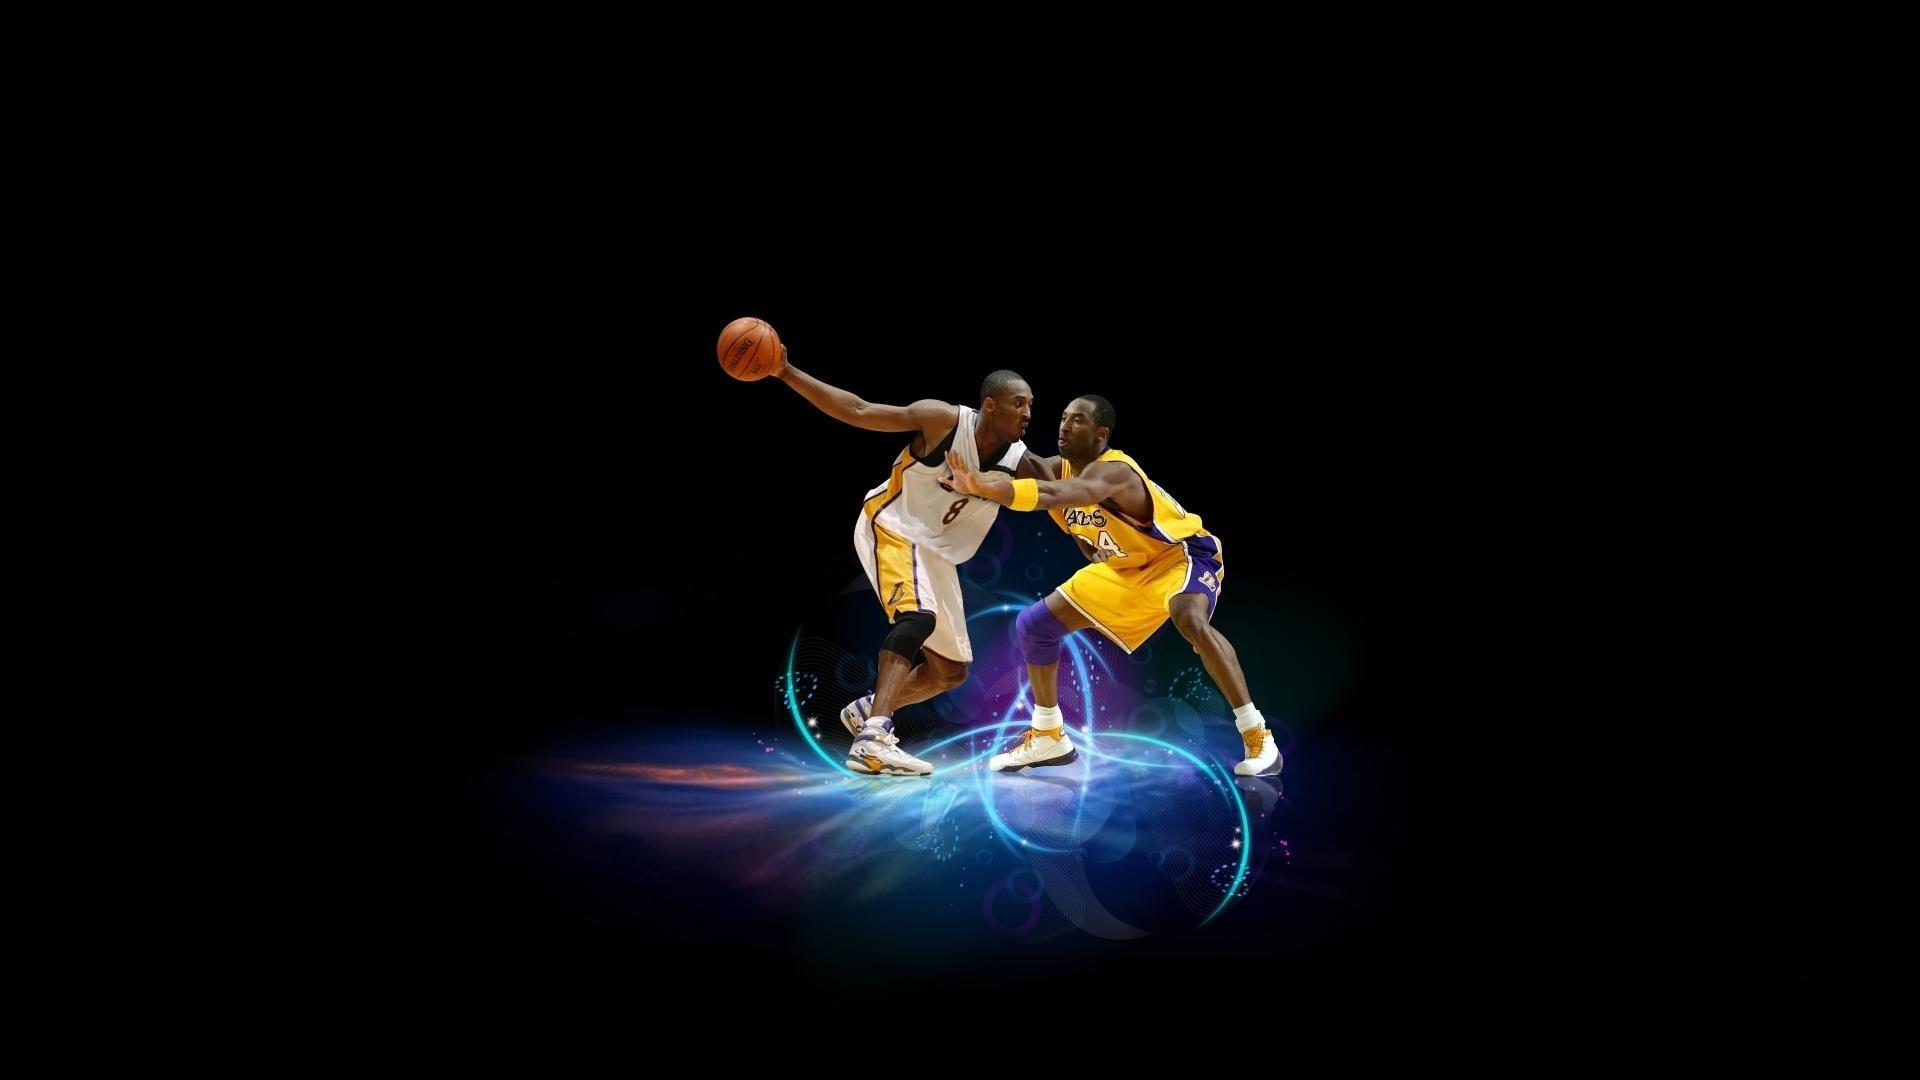 Sports Basketball Wallpaper 1080x1920px Hd Wallpapers Sport 1920x1080